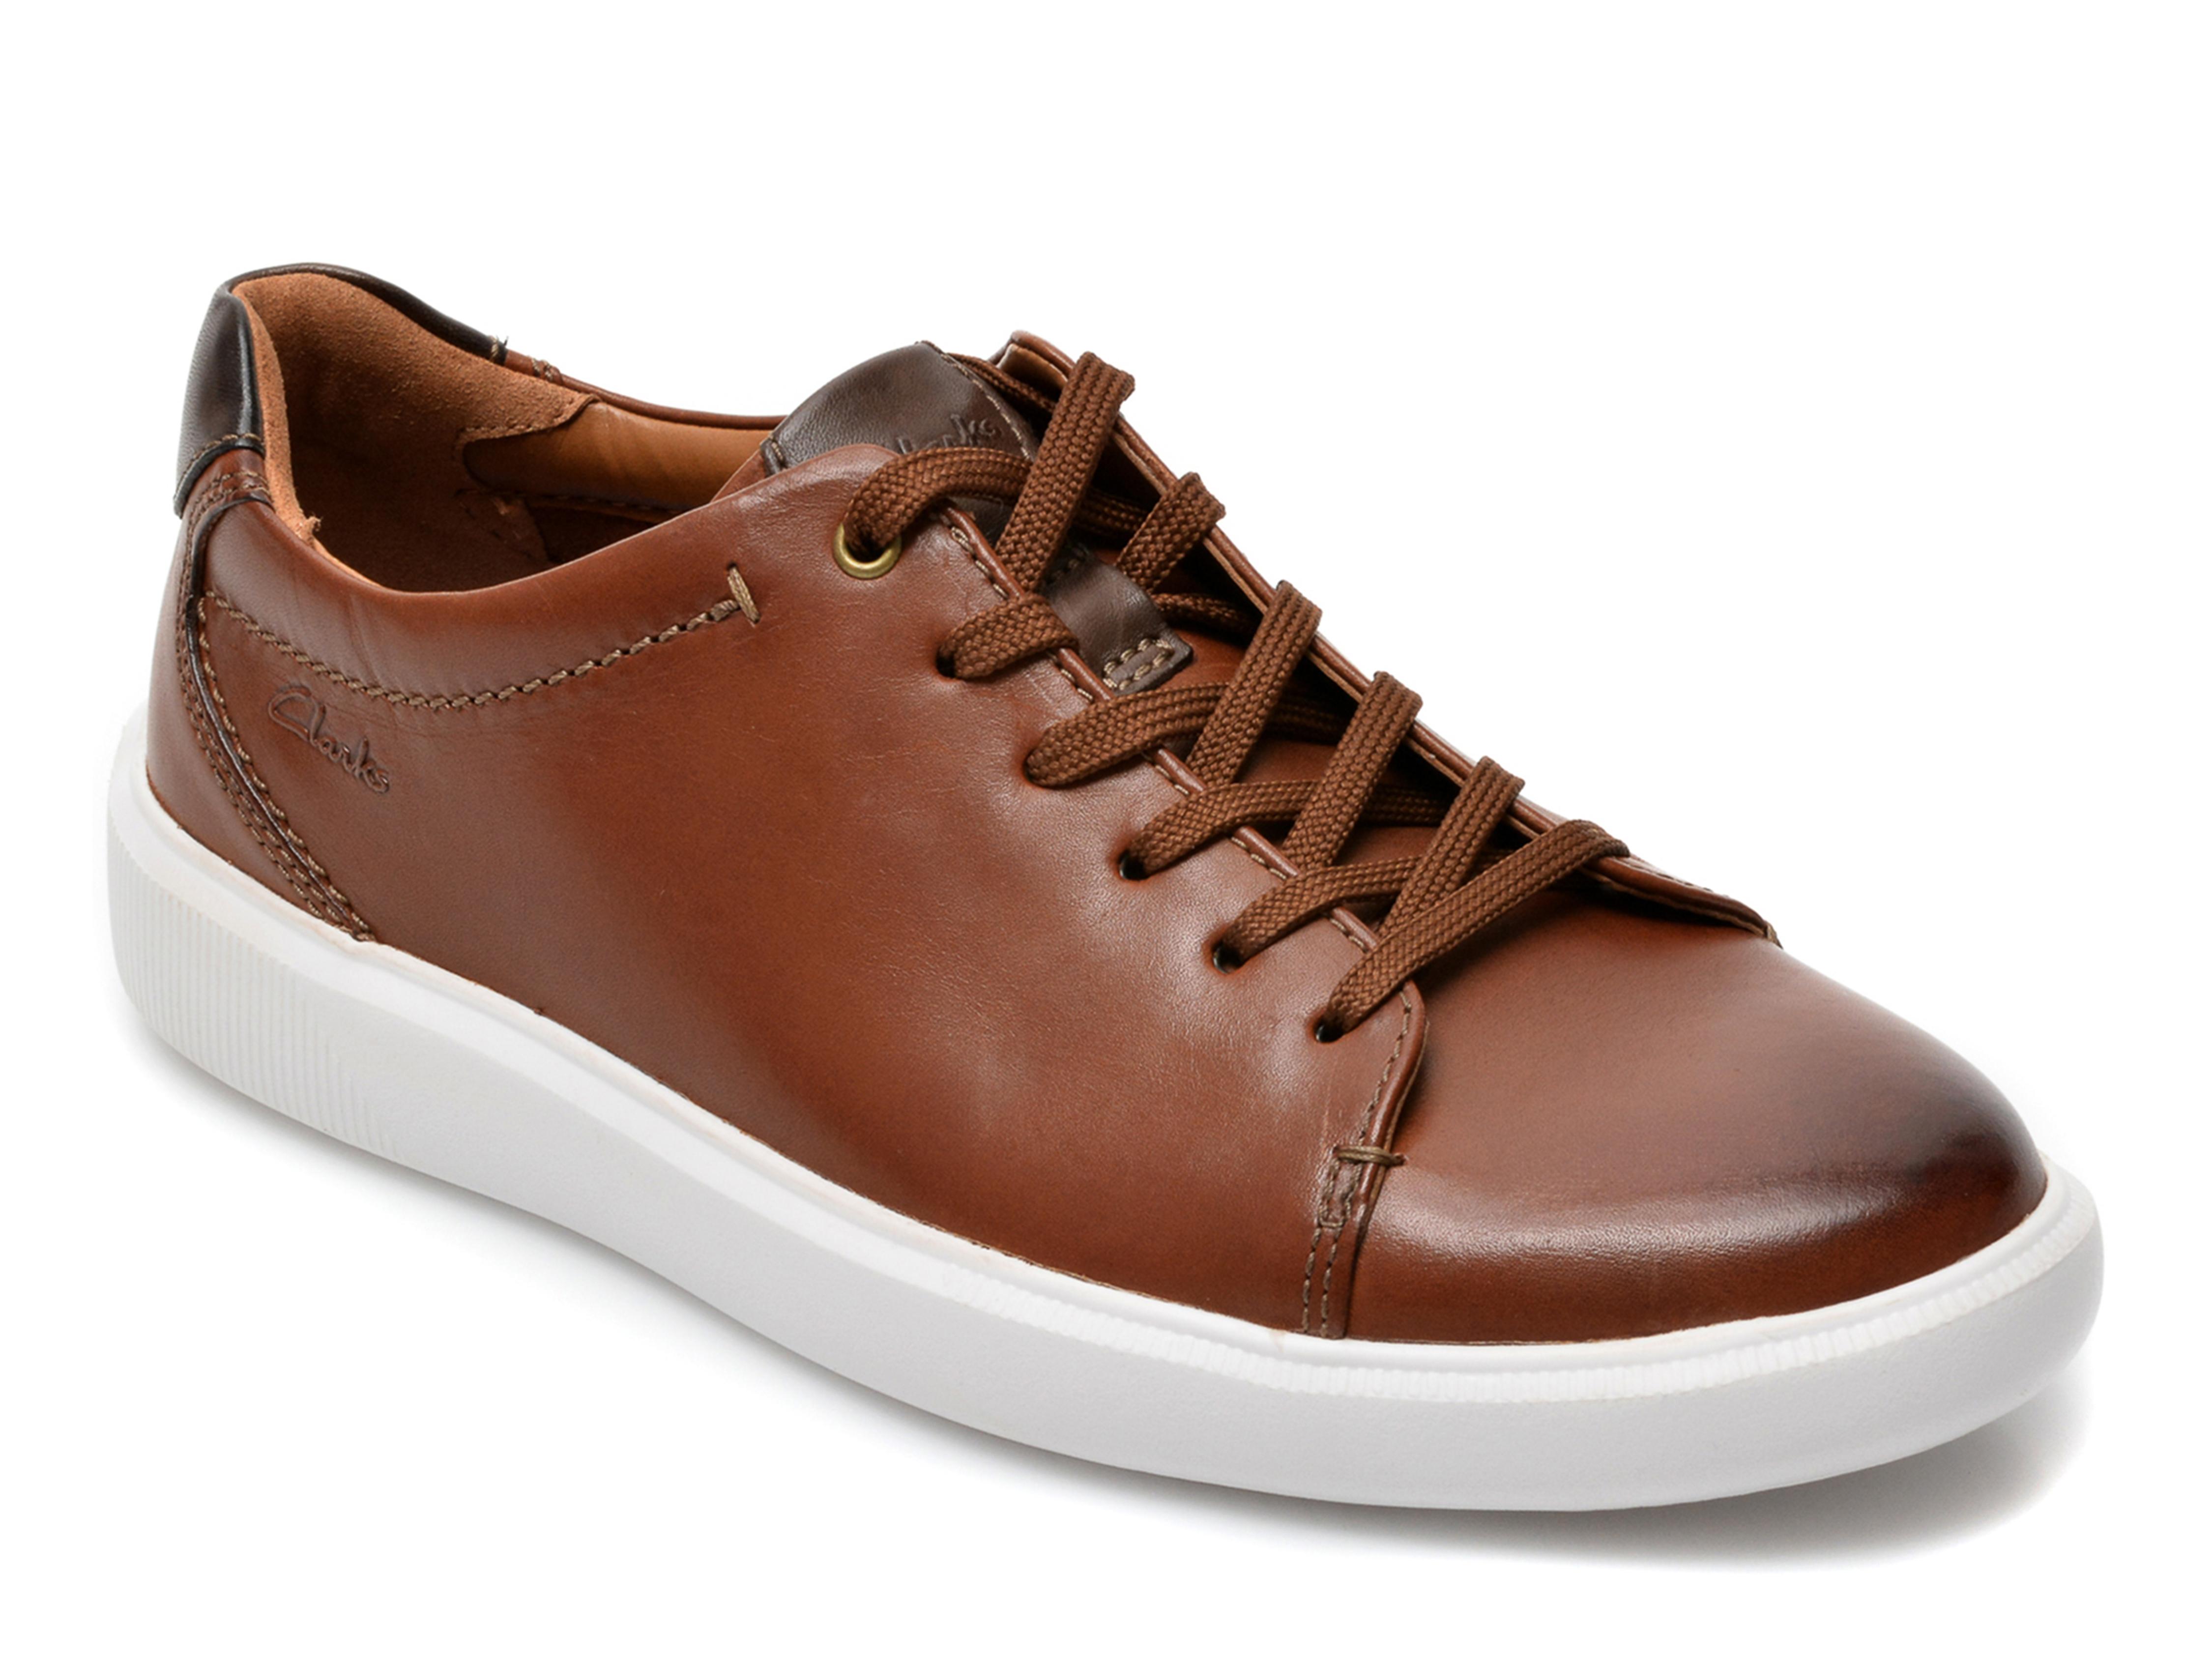 Pantofi CLARKS maro, Cambro Low, din piele naturala imagine otter.ro 2021